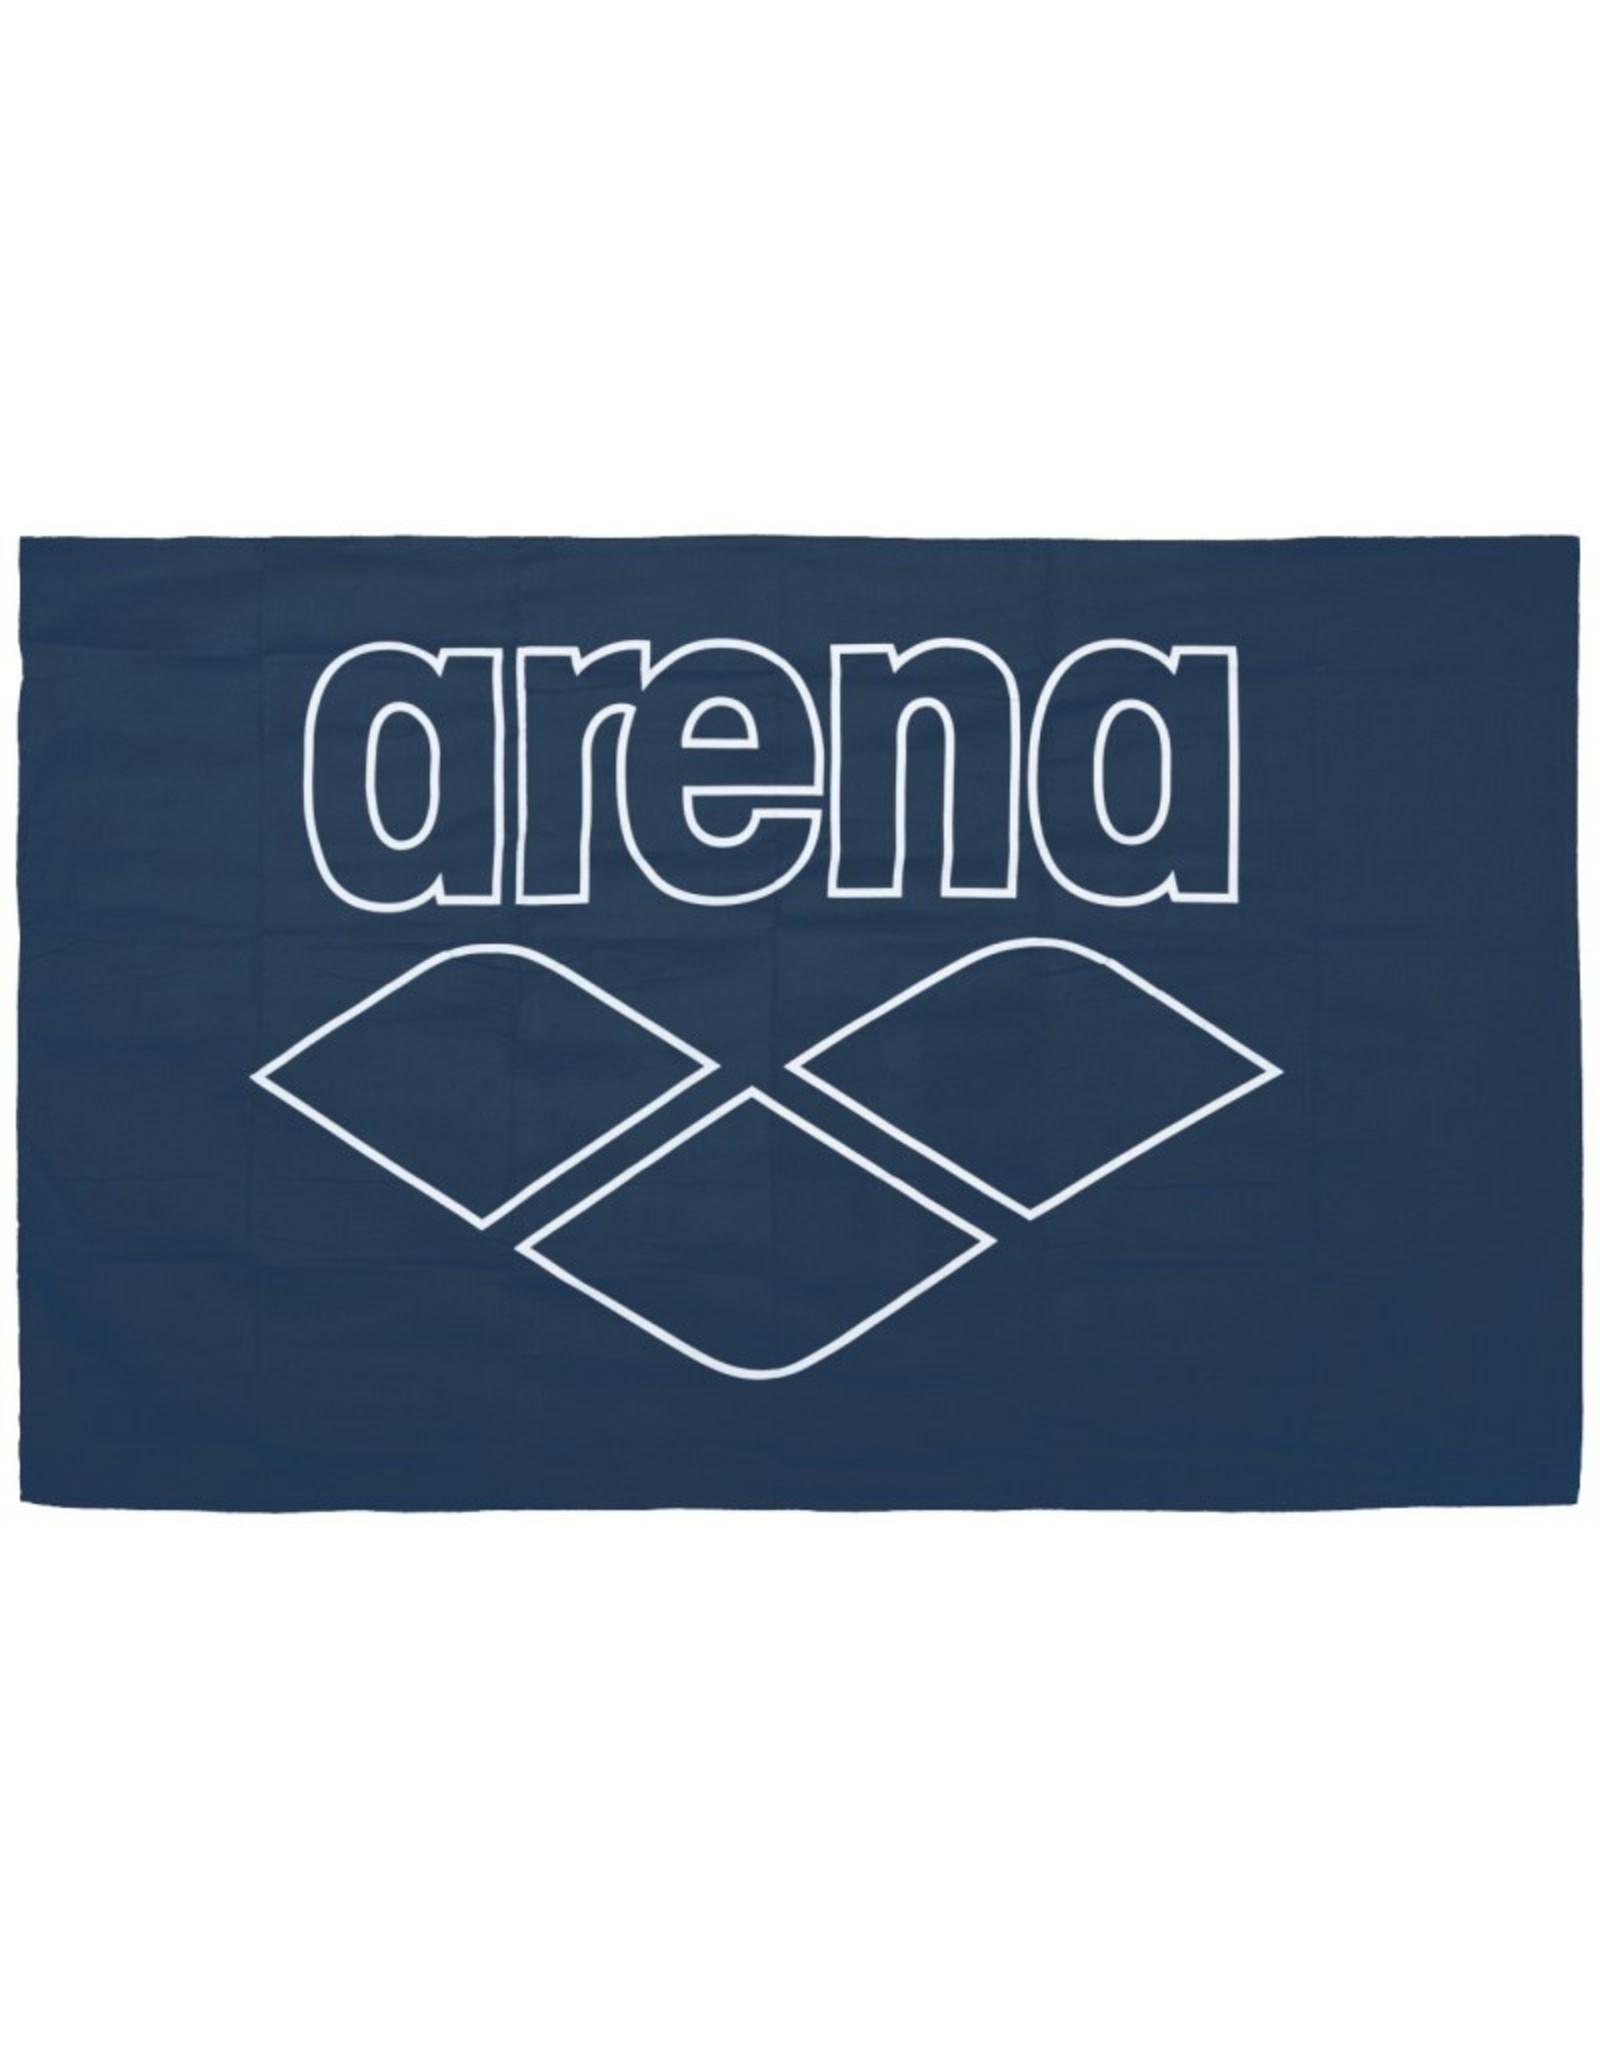 Arena Pool Smart Towel-navy-white